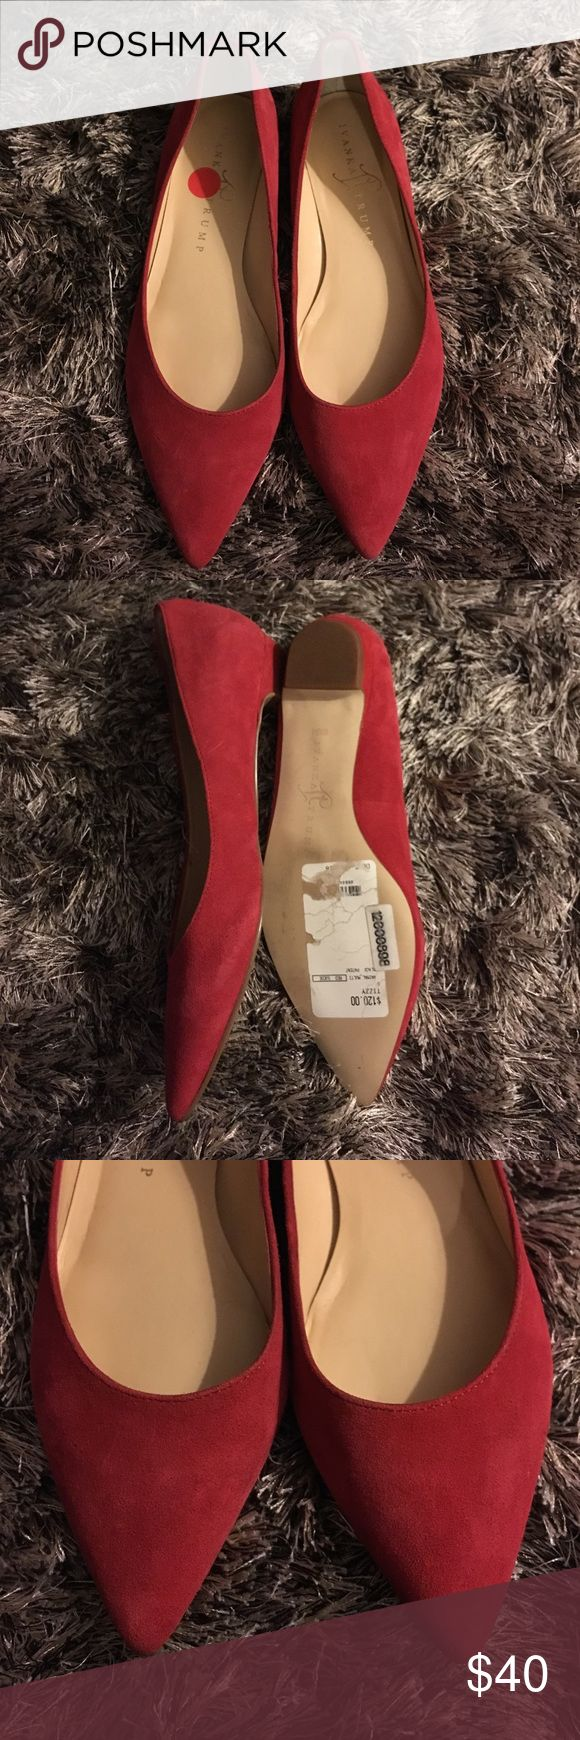 Brand New Ivanka Trump flats Brand new suede pointed toe ballet flats. Ivanka Trump Shoes Flats & Loafers